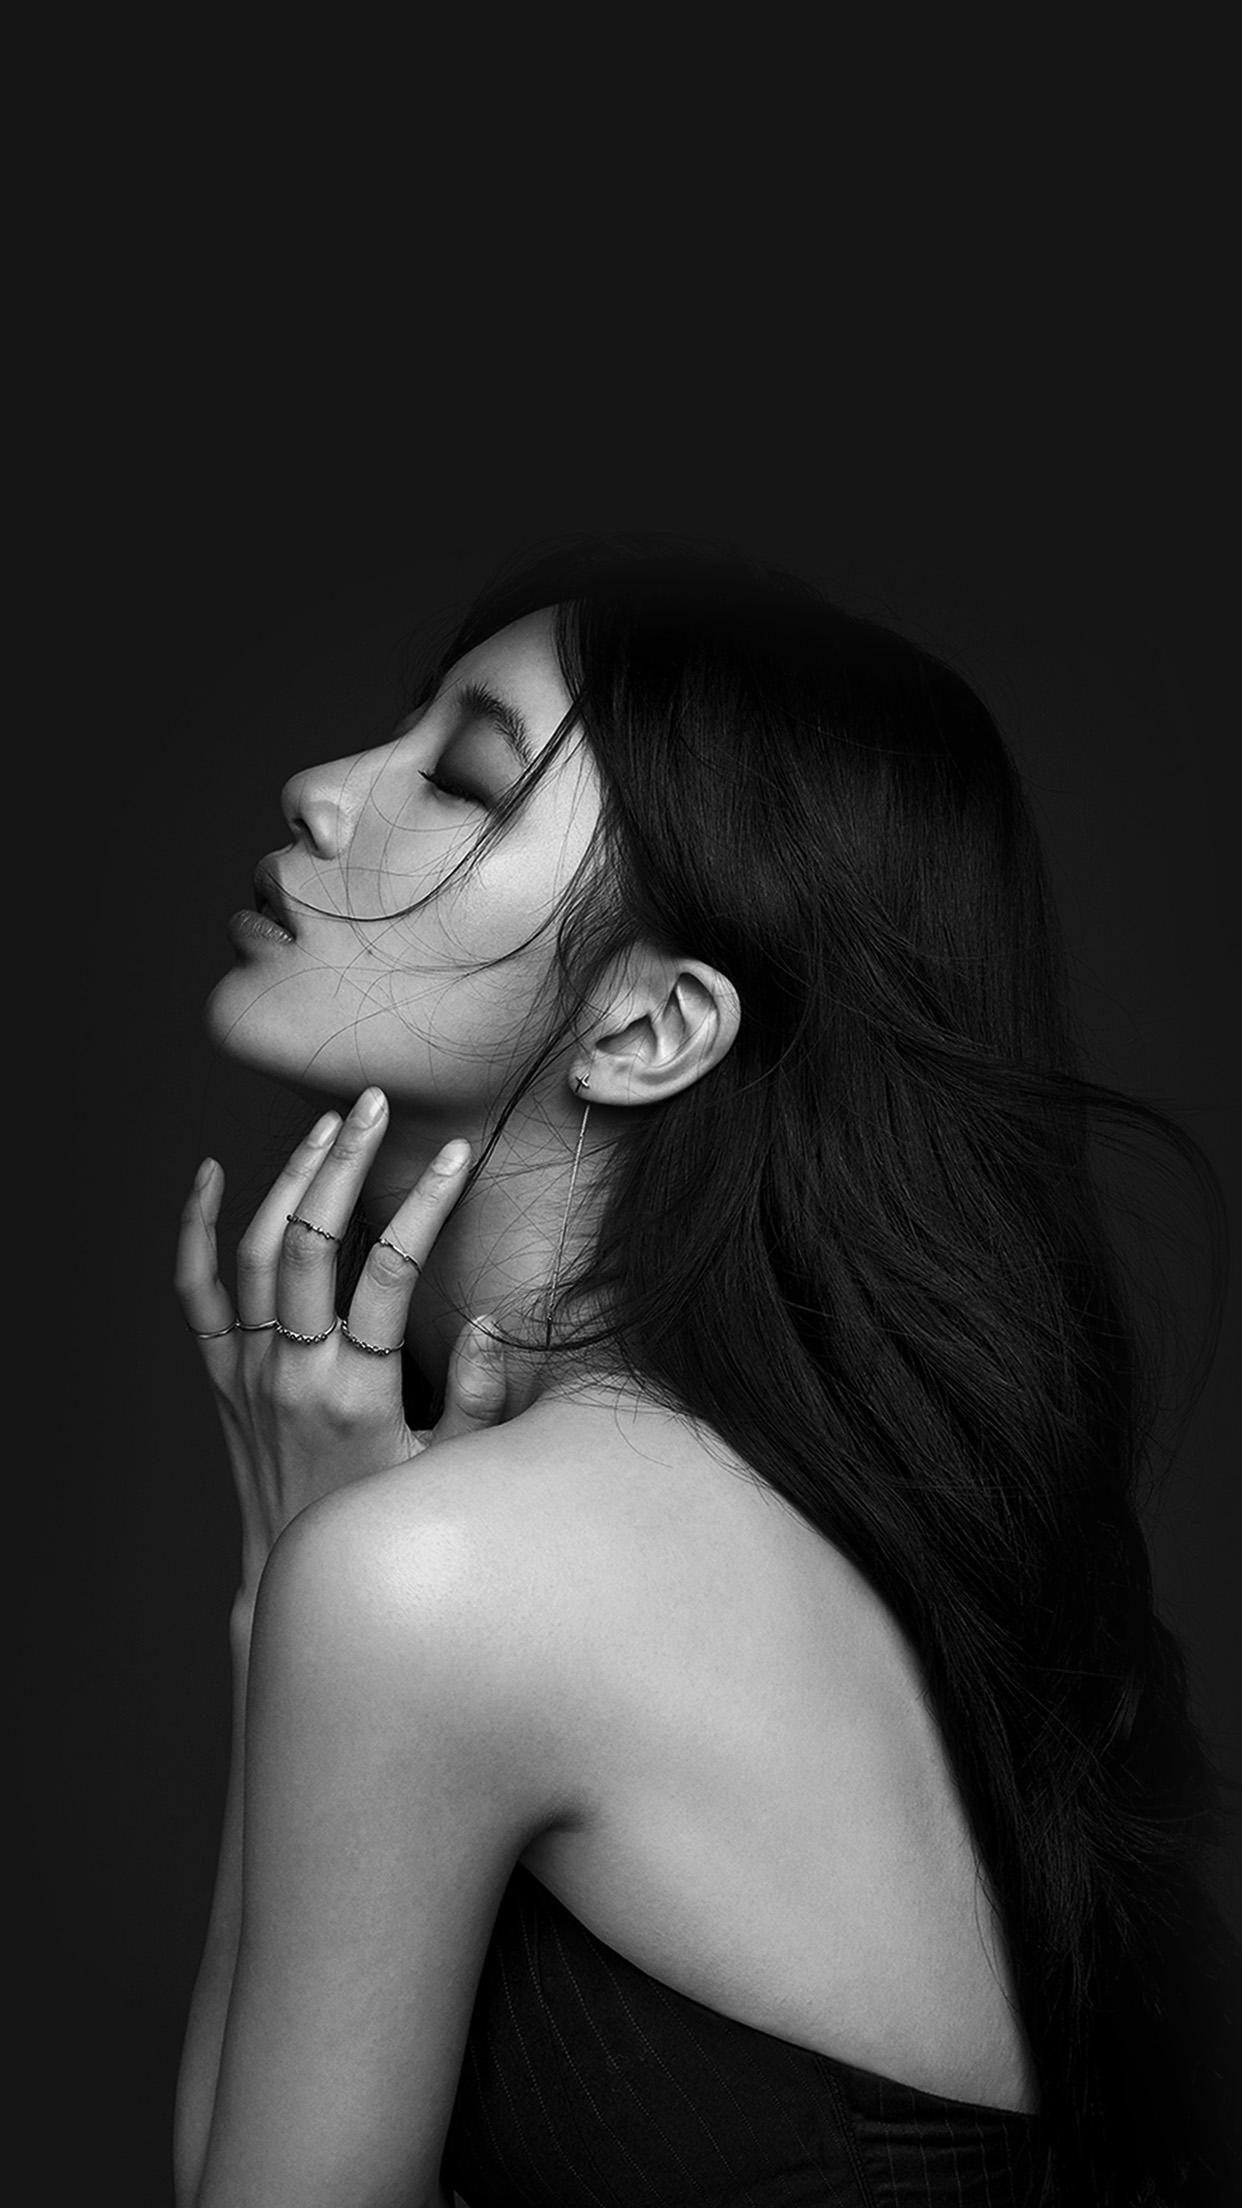 Hi44 Suji Dark Bw Kpop Girl Wallpaper